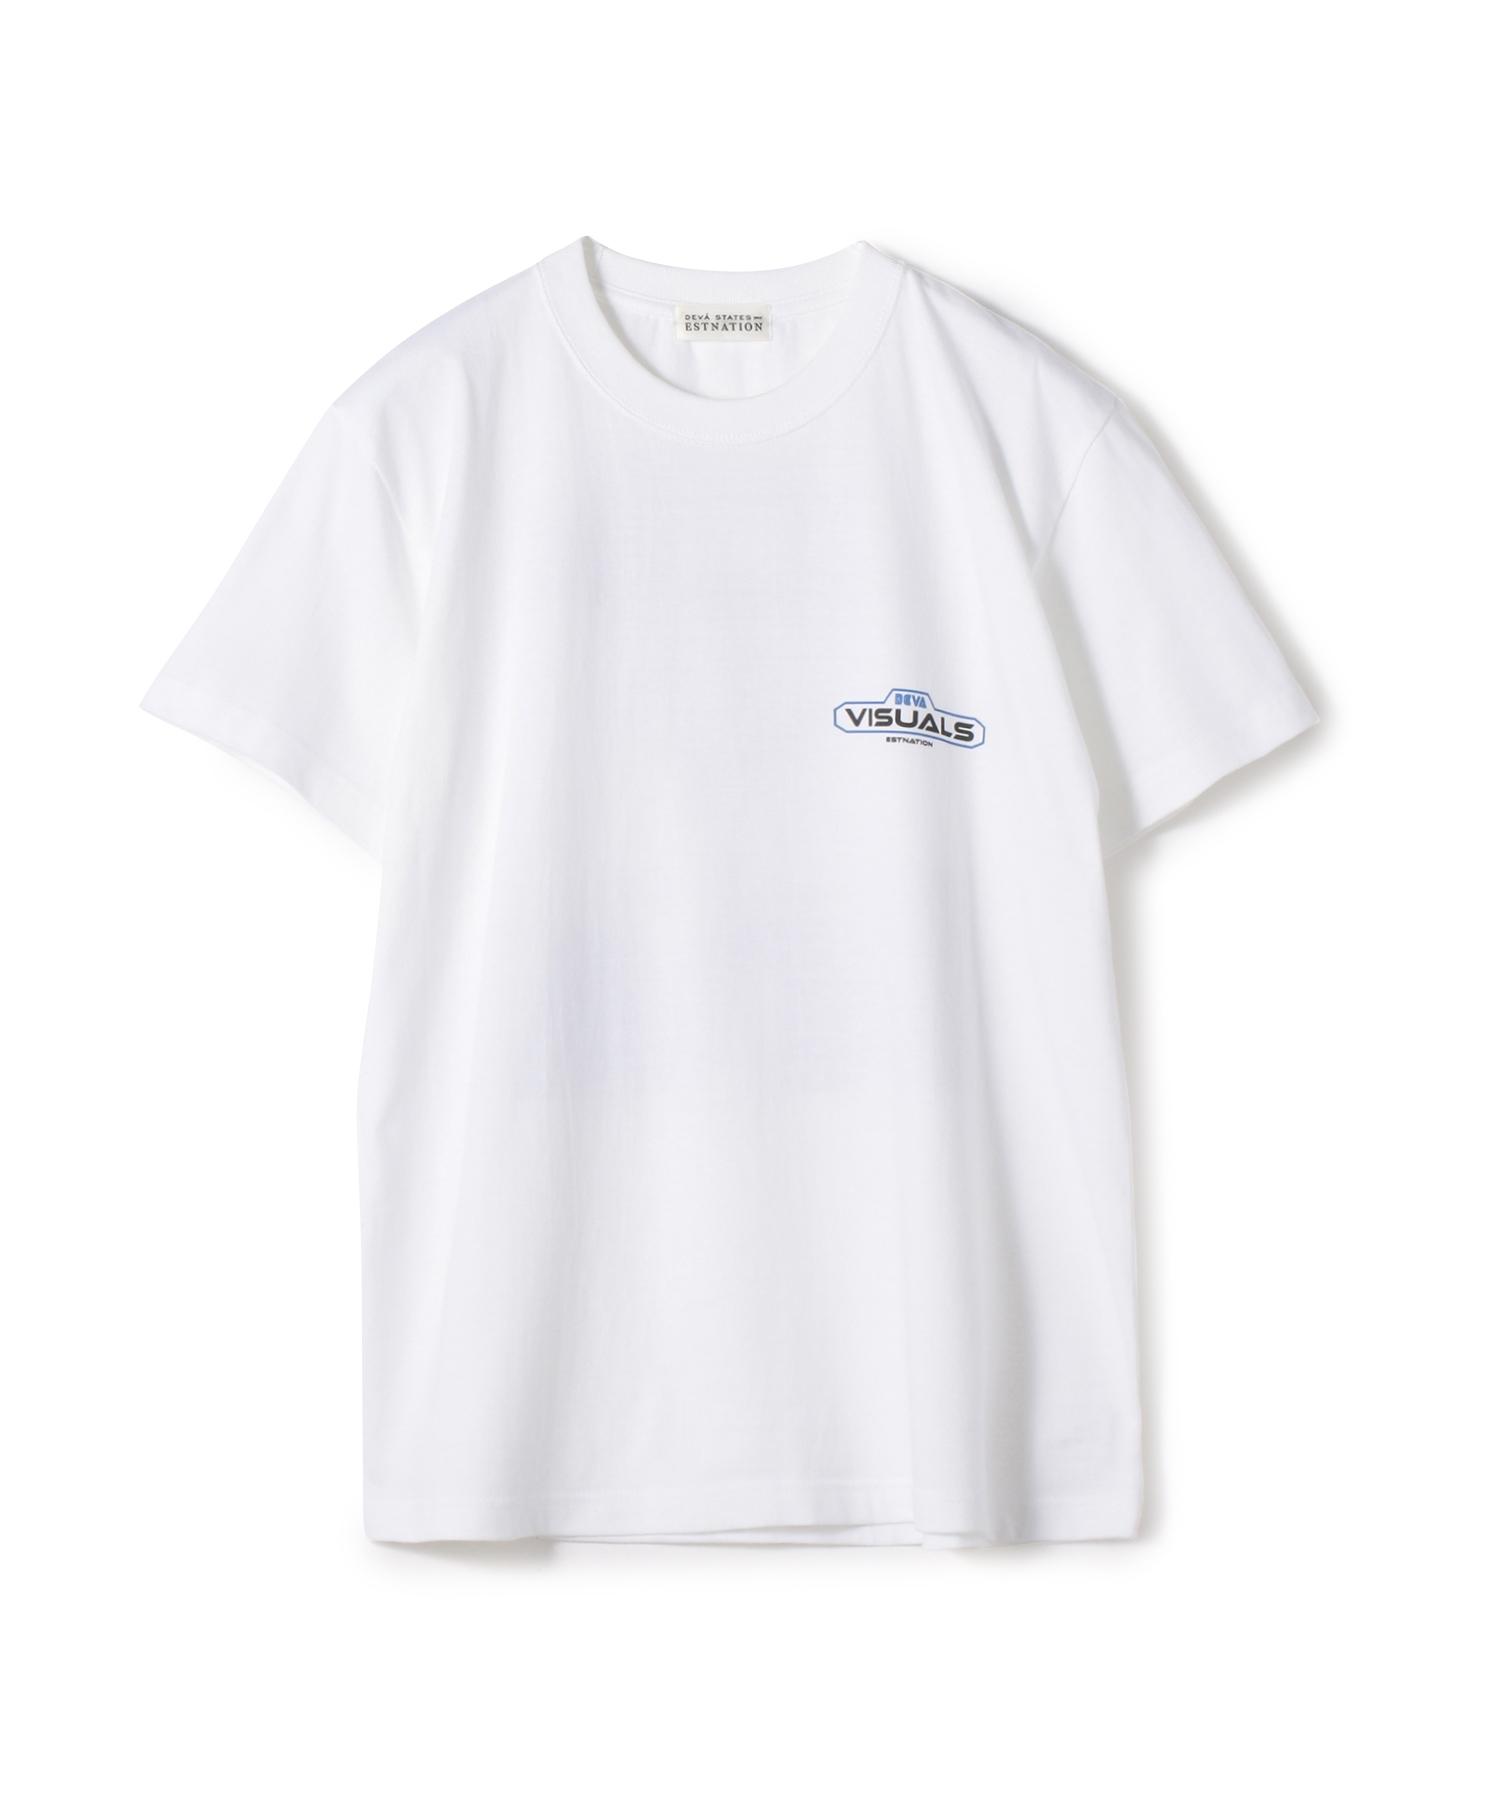 "DEVA STATES / ""VISUALS"" Tシャツ《ESTNATION EXCLUSIVE》"